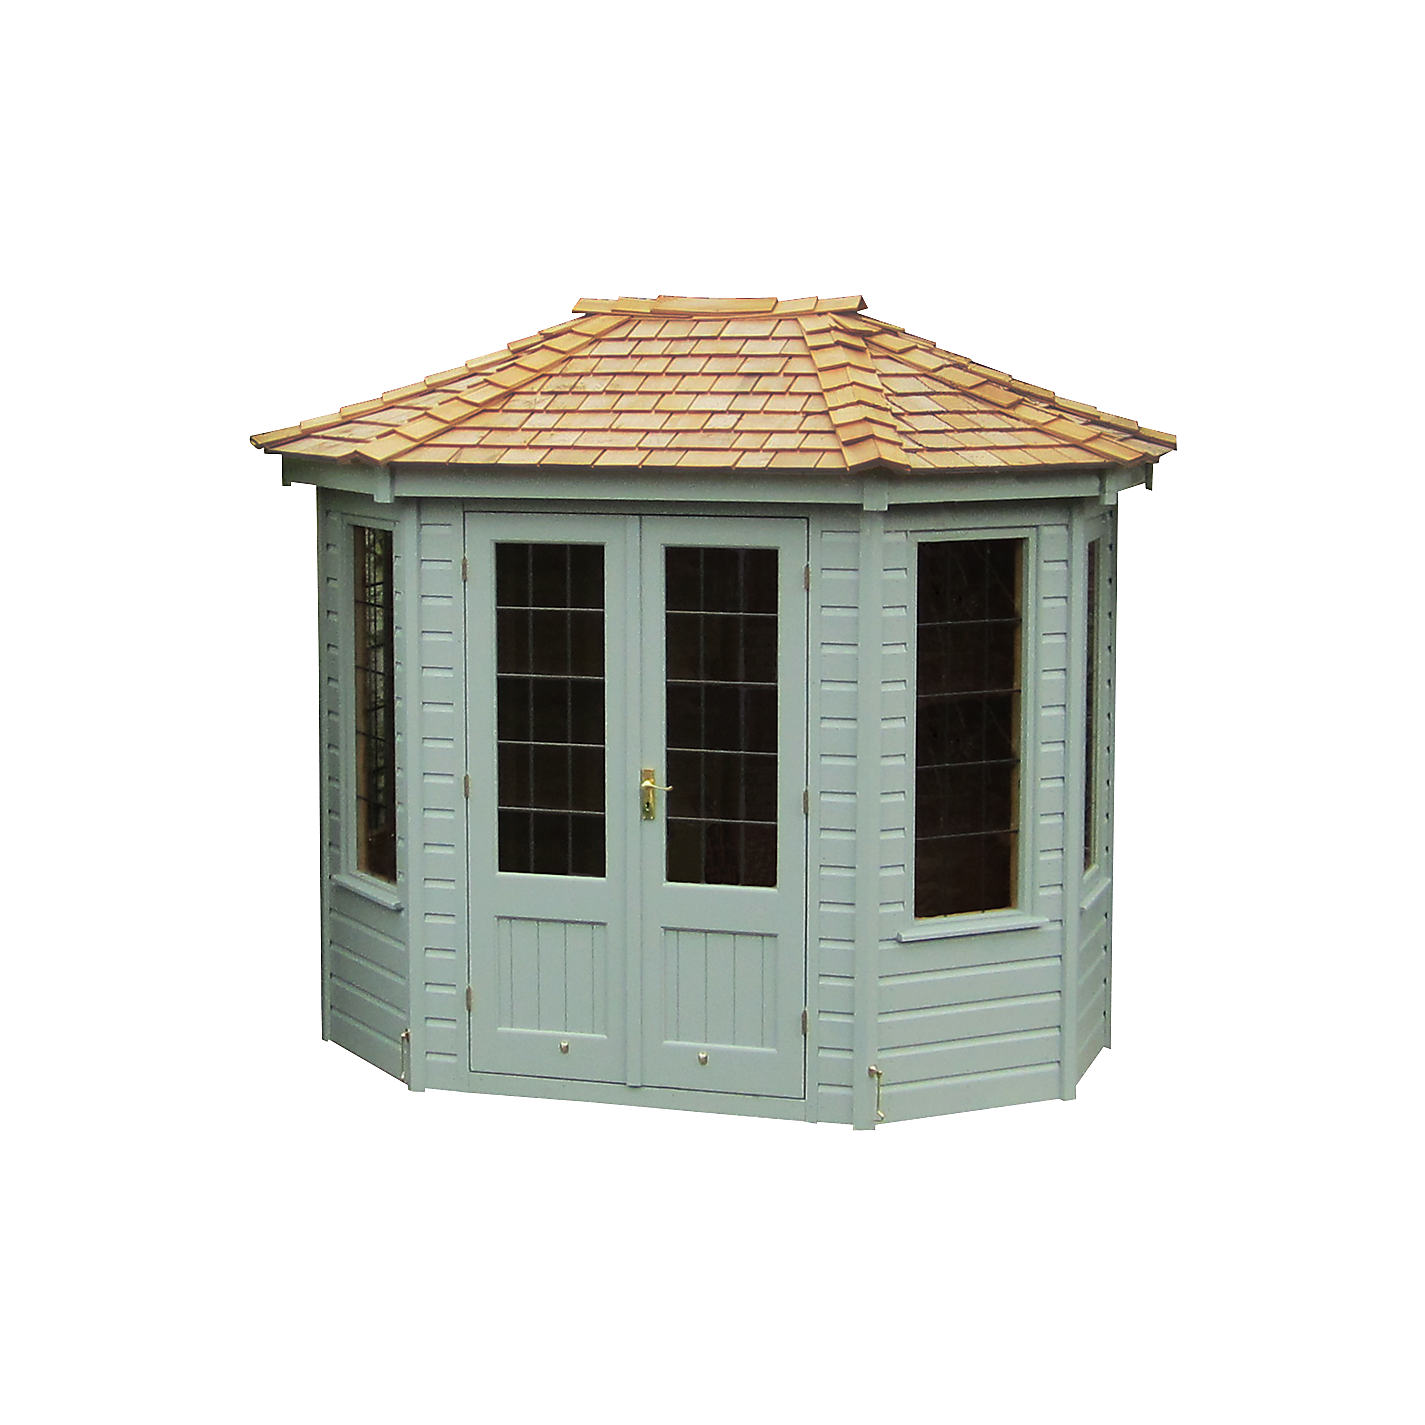 buy crane 18 x 25m summerhouse fsc certified scandinavian redwood online - Garden Sheds John Lewis